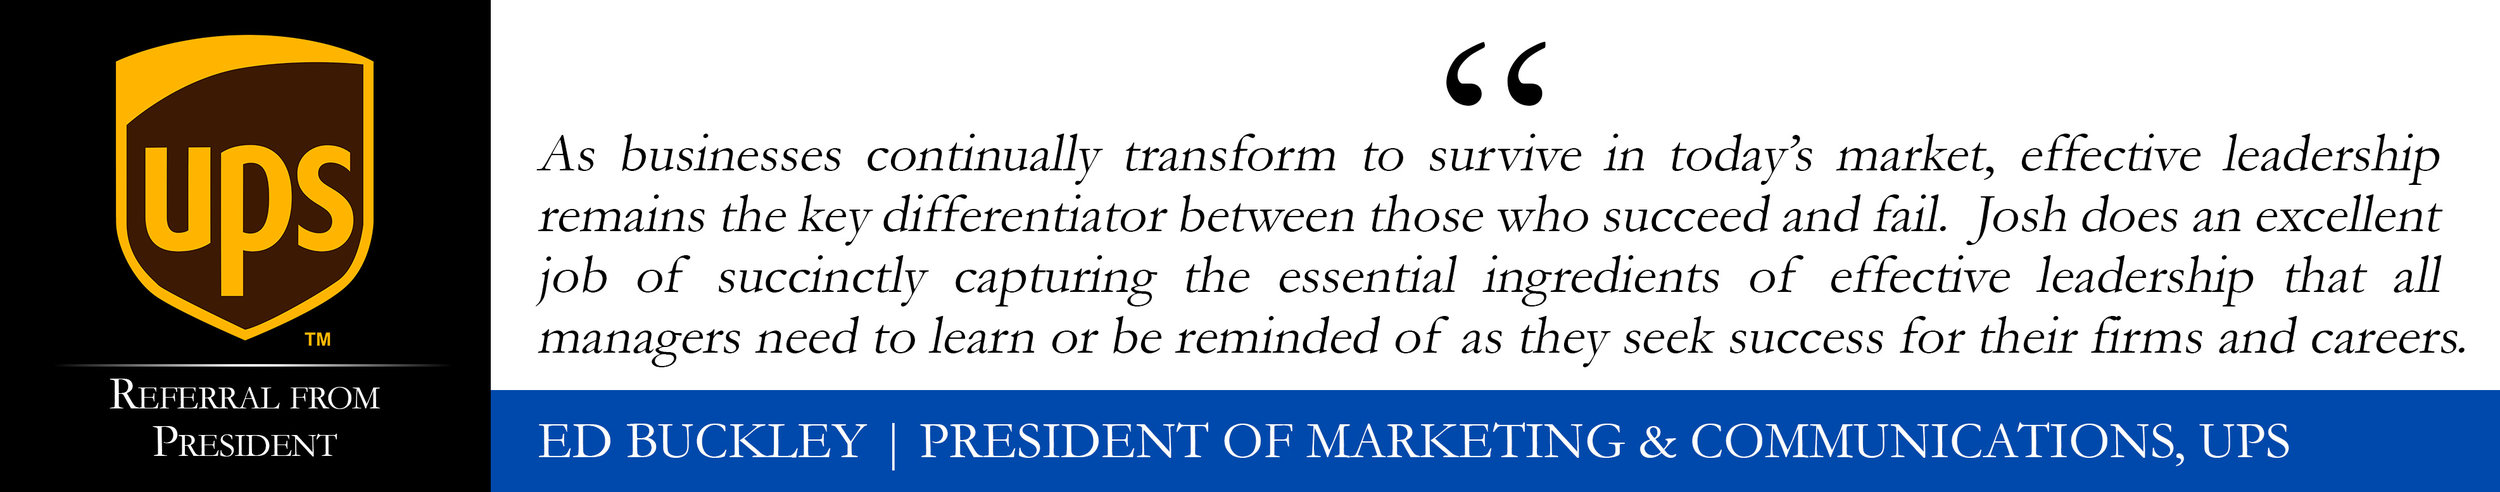 Leadership Redefined Quote 3.jpg